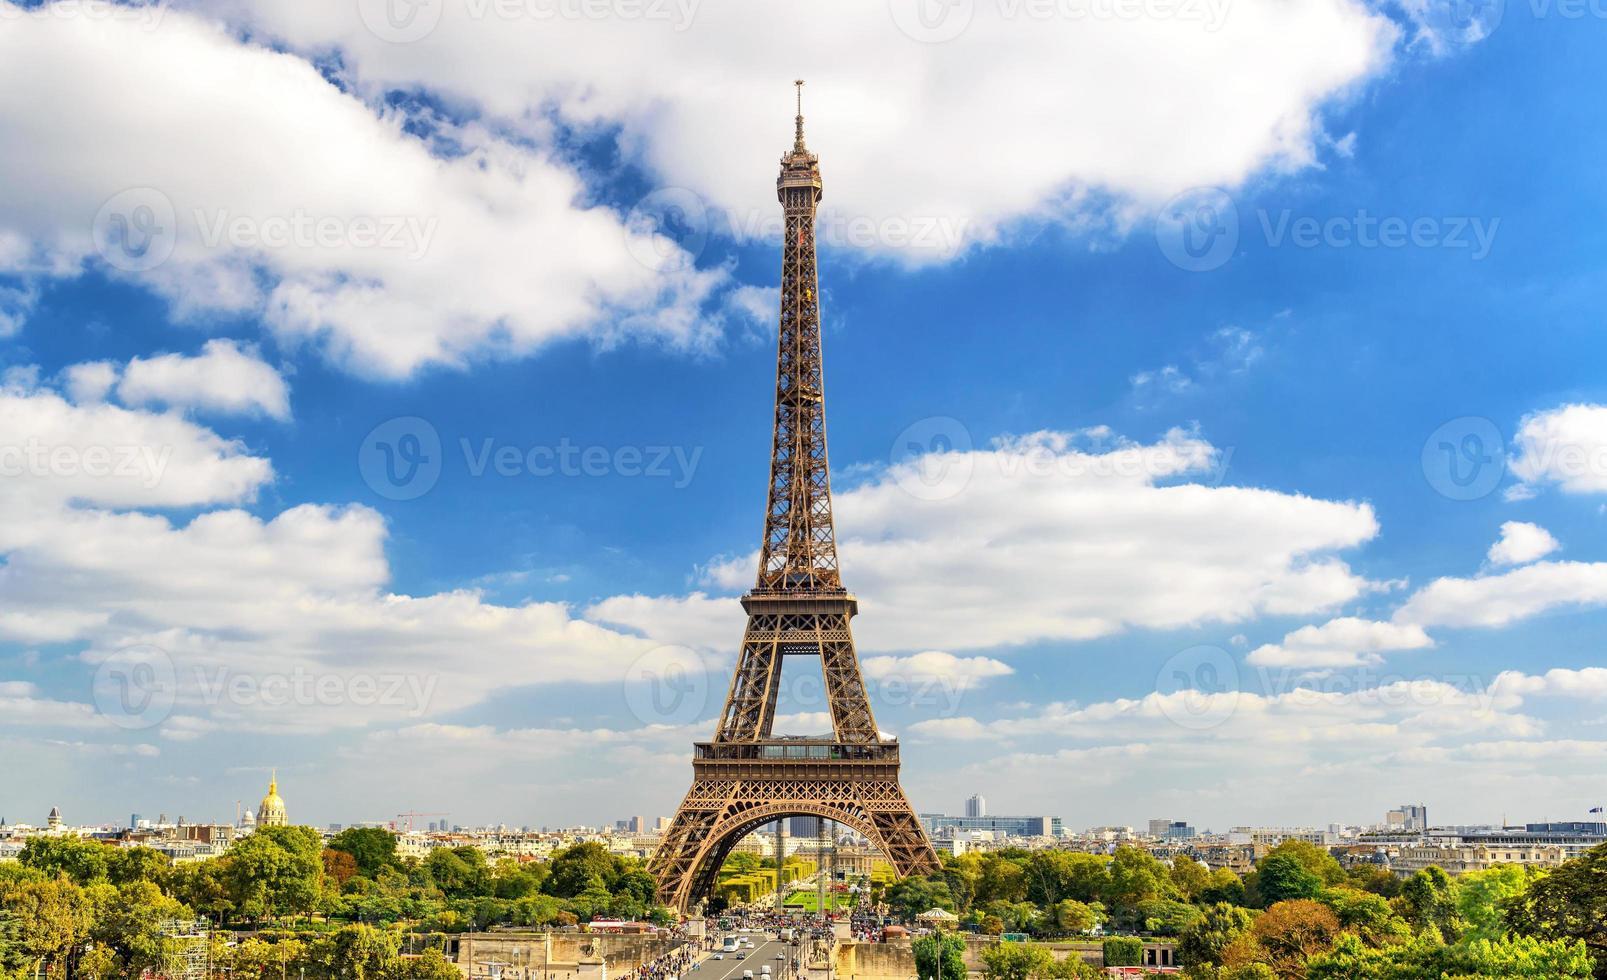 Eiffel tower, Paris skyline photo